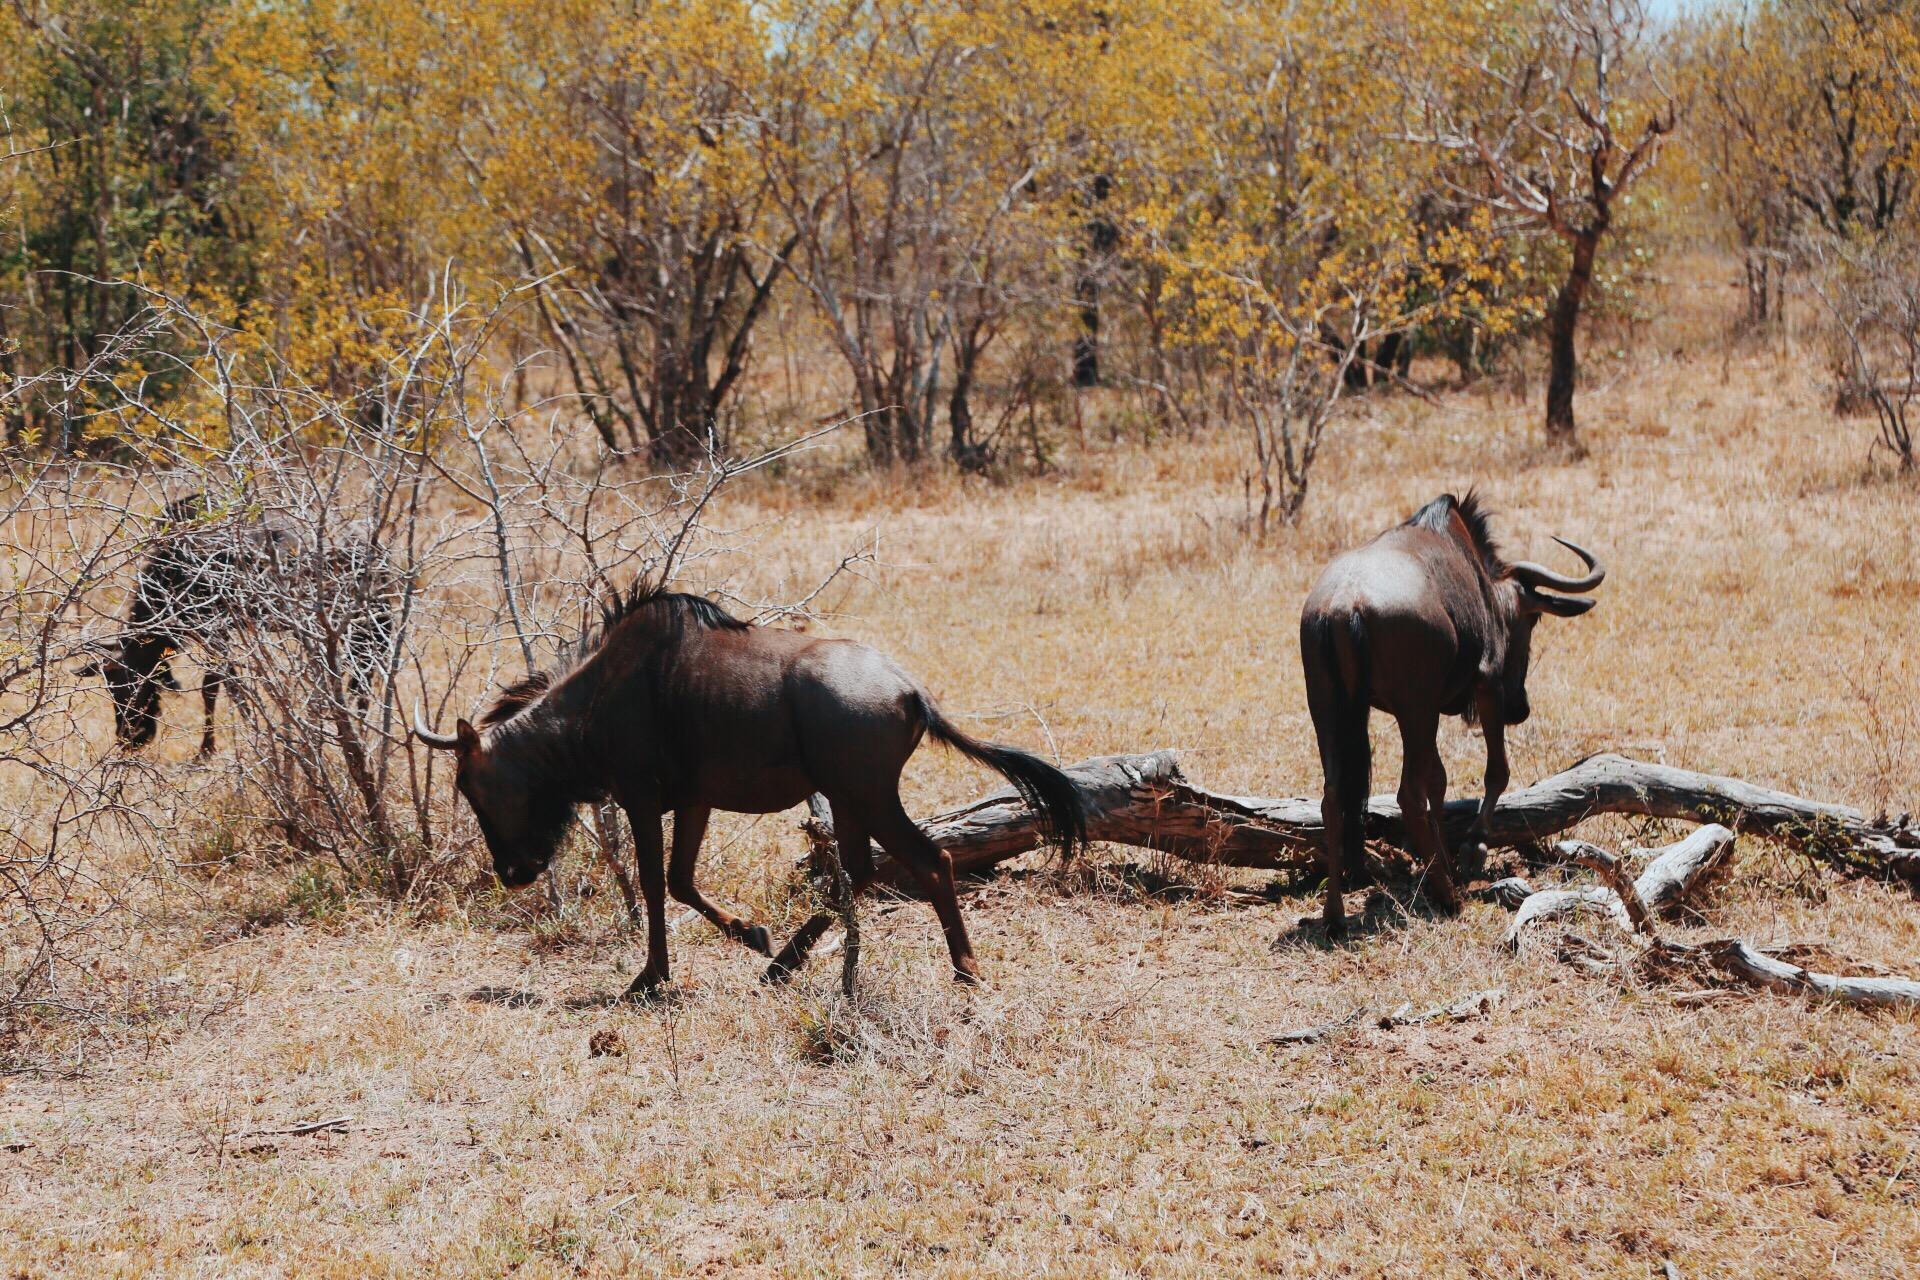 Safari In South Africa - A Photo Diary (10)